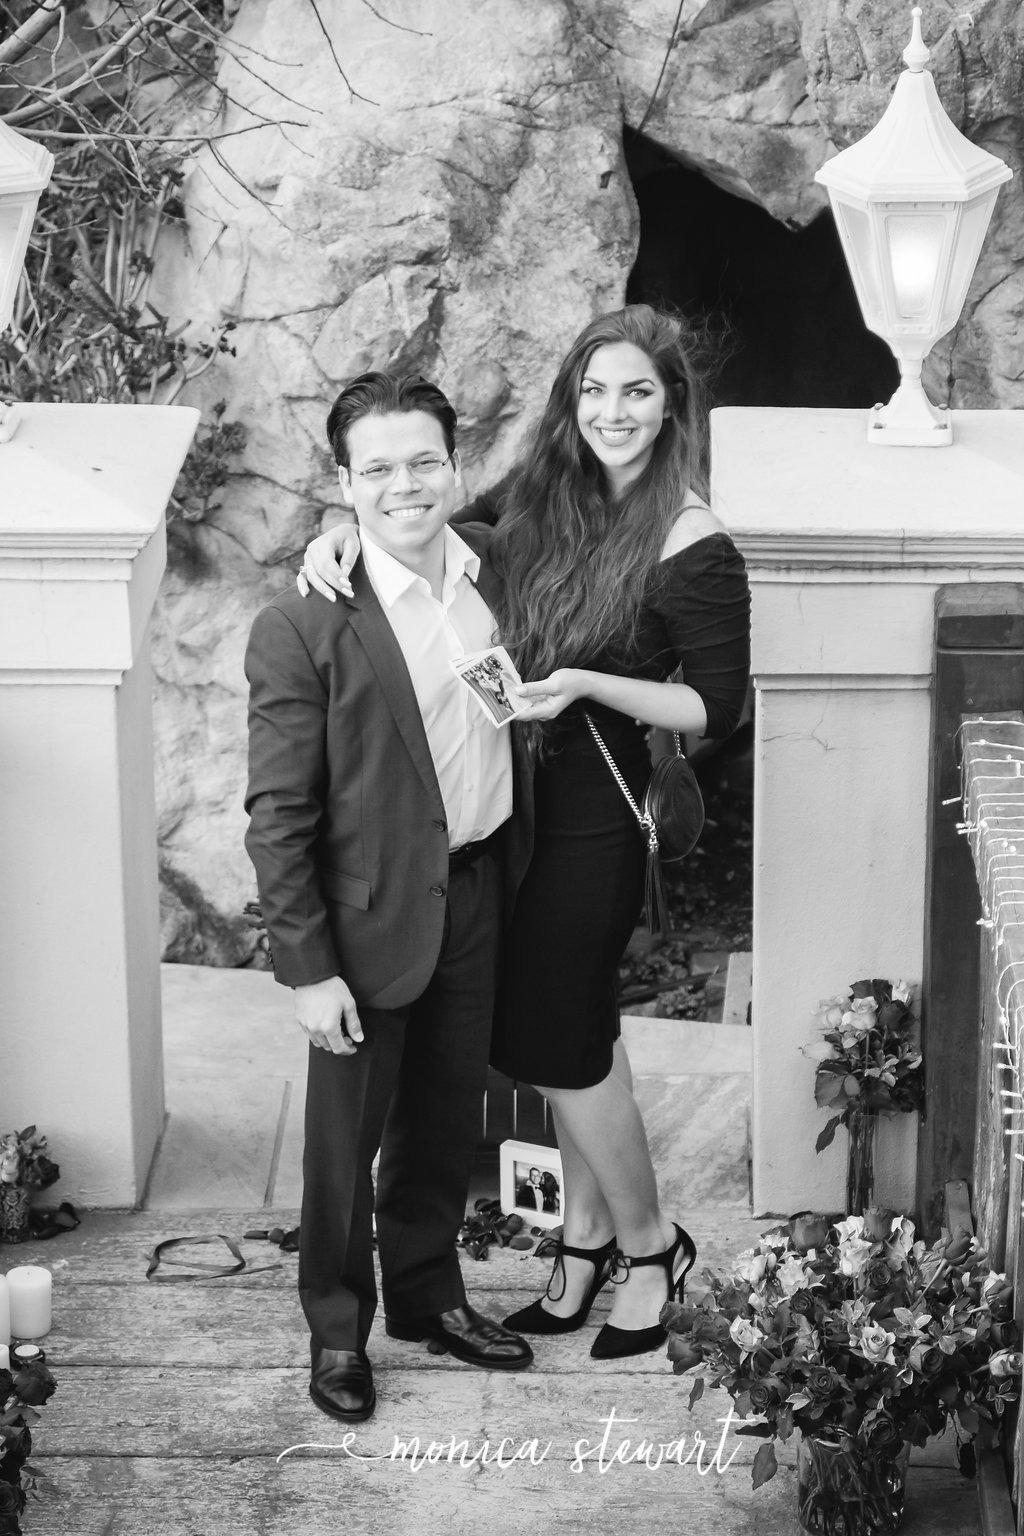 Harry and Natasha romantic marriage proposal